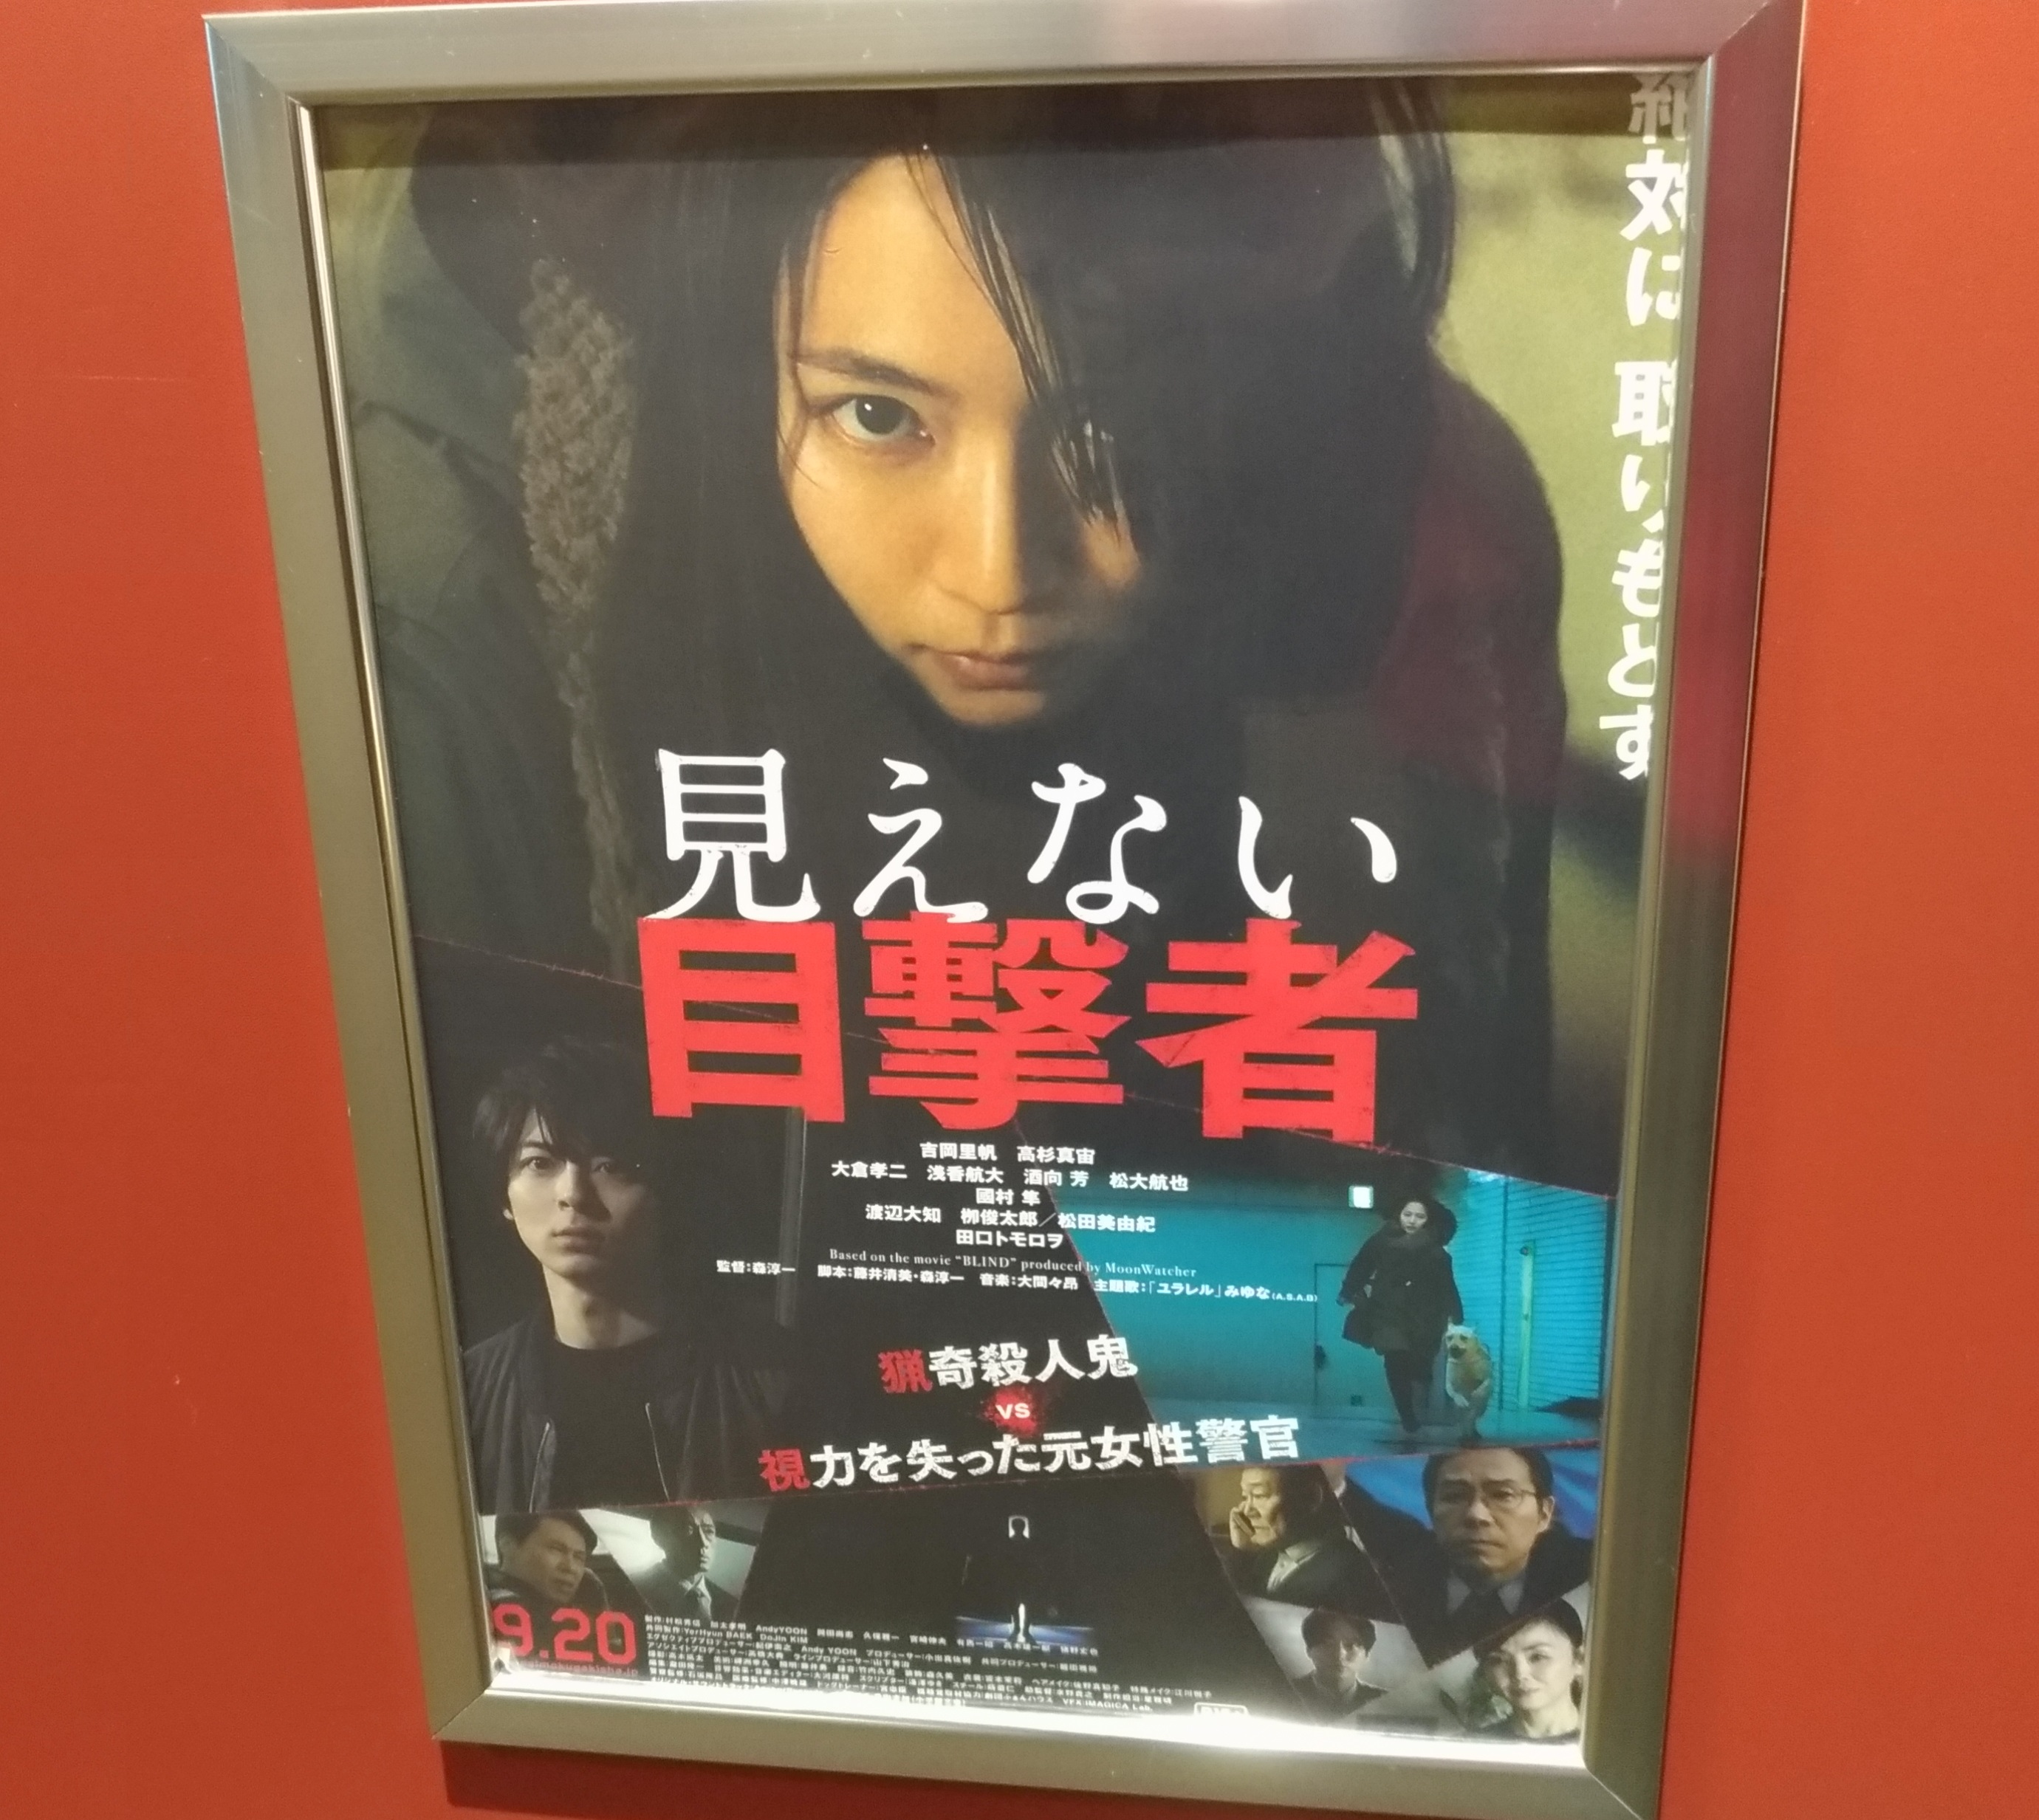 movies_mienai_mokugekisya_.jpg